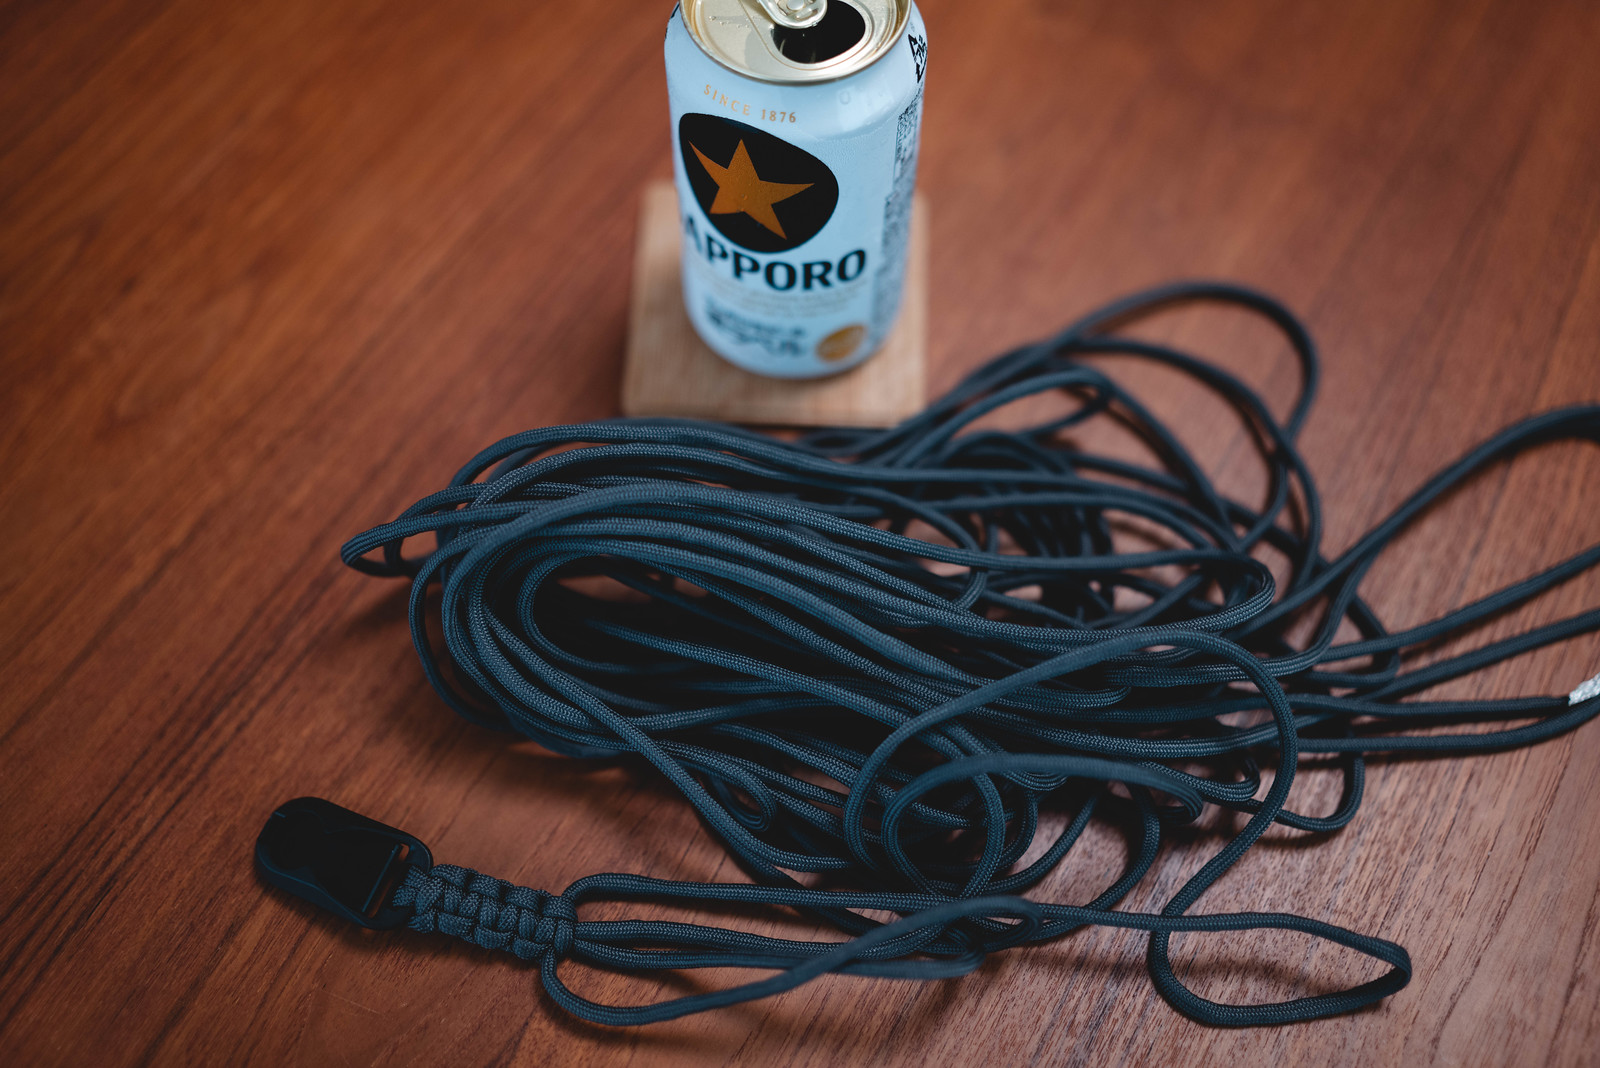 making a camera strap